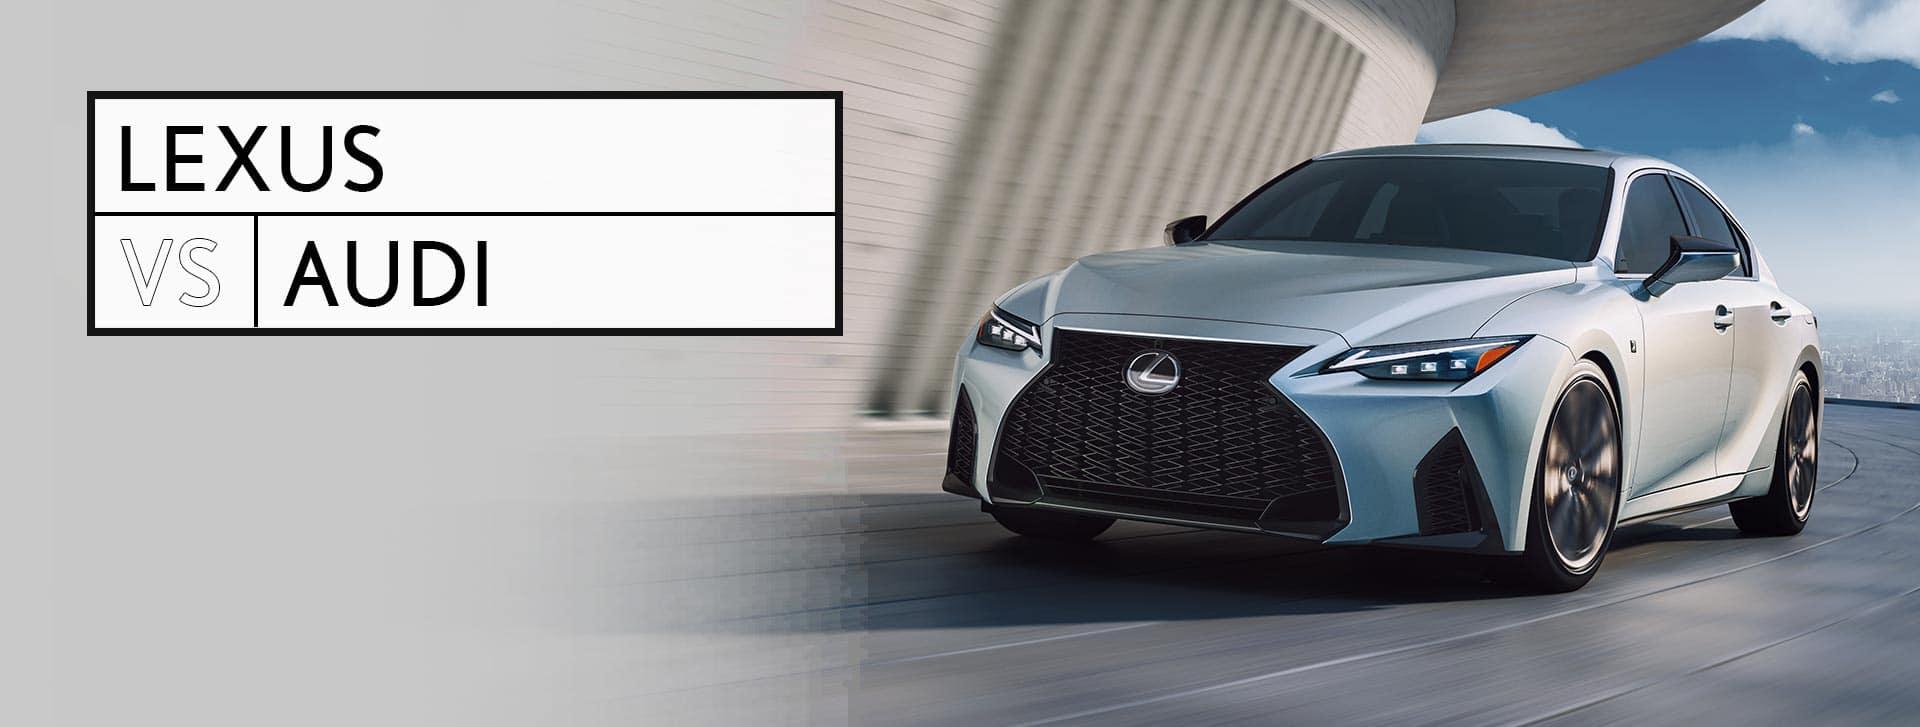 Lexus vs Audi Metro Detroit